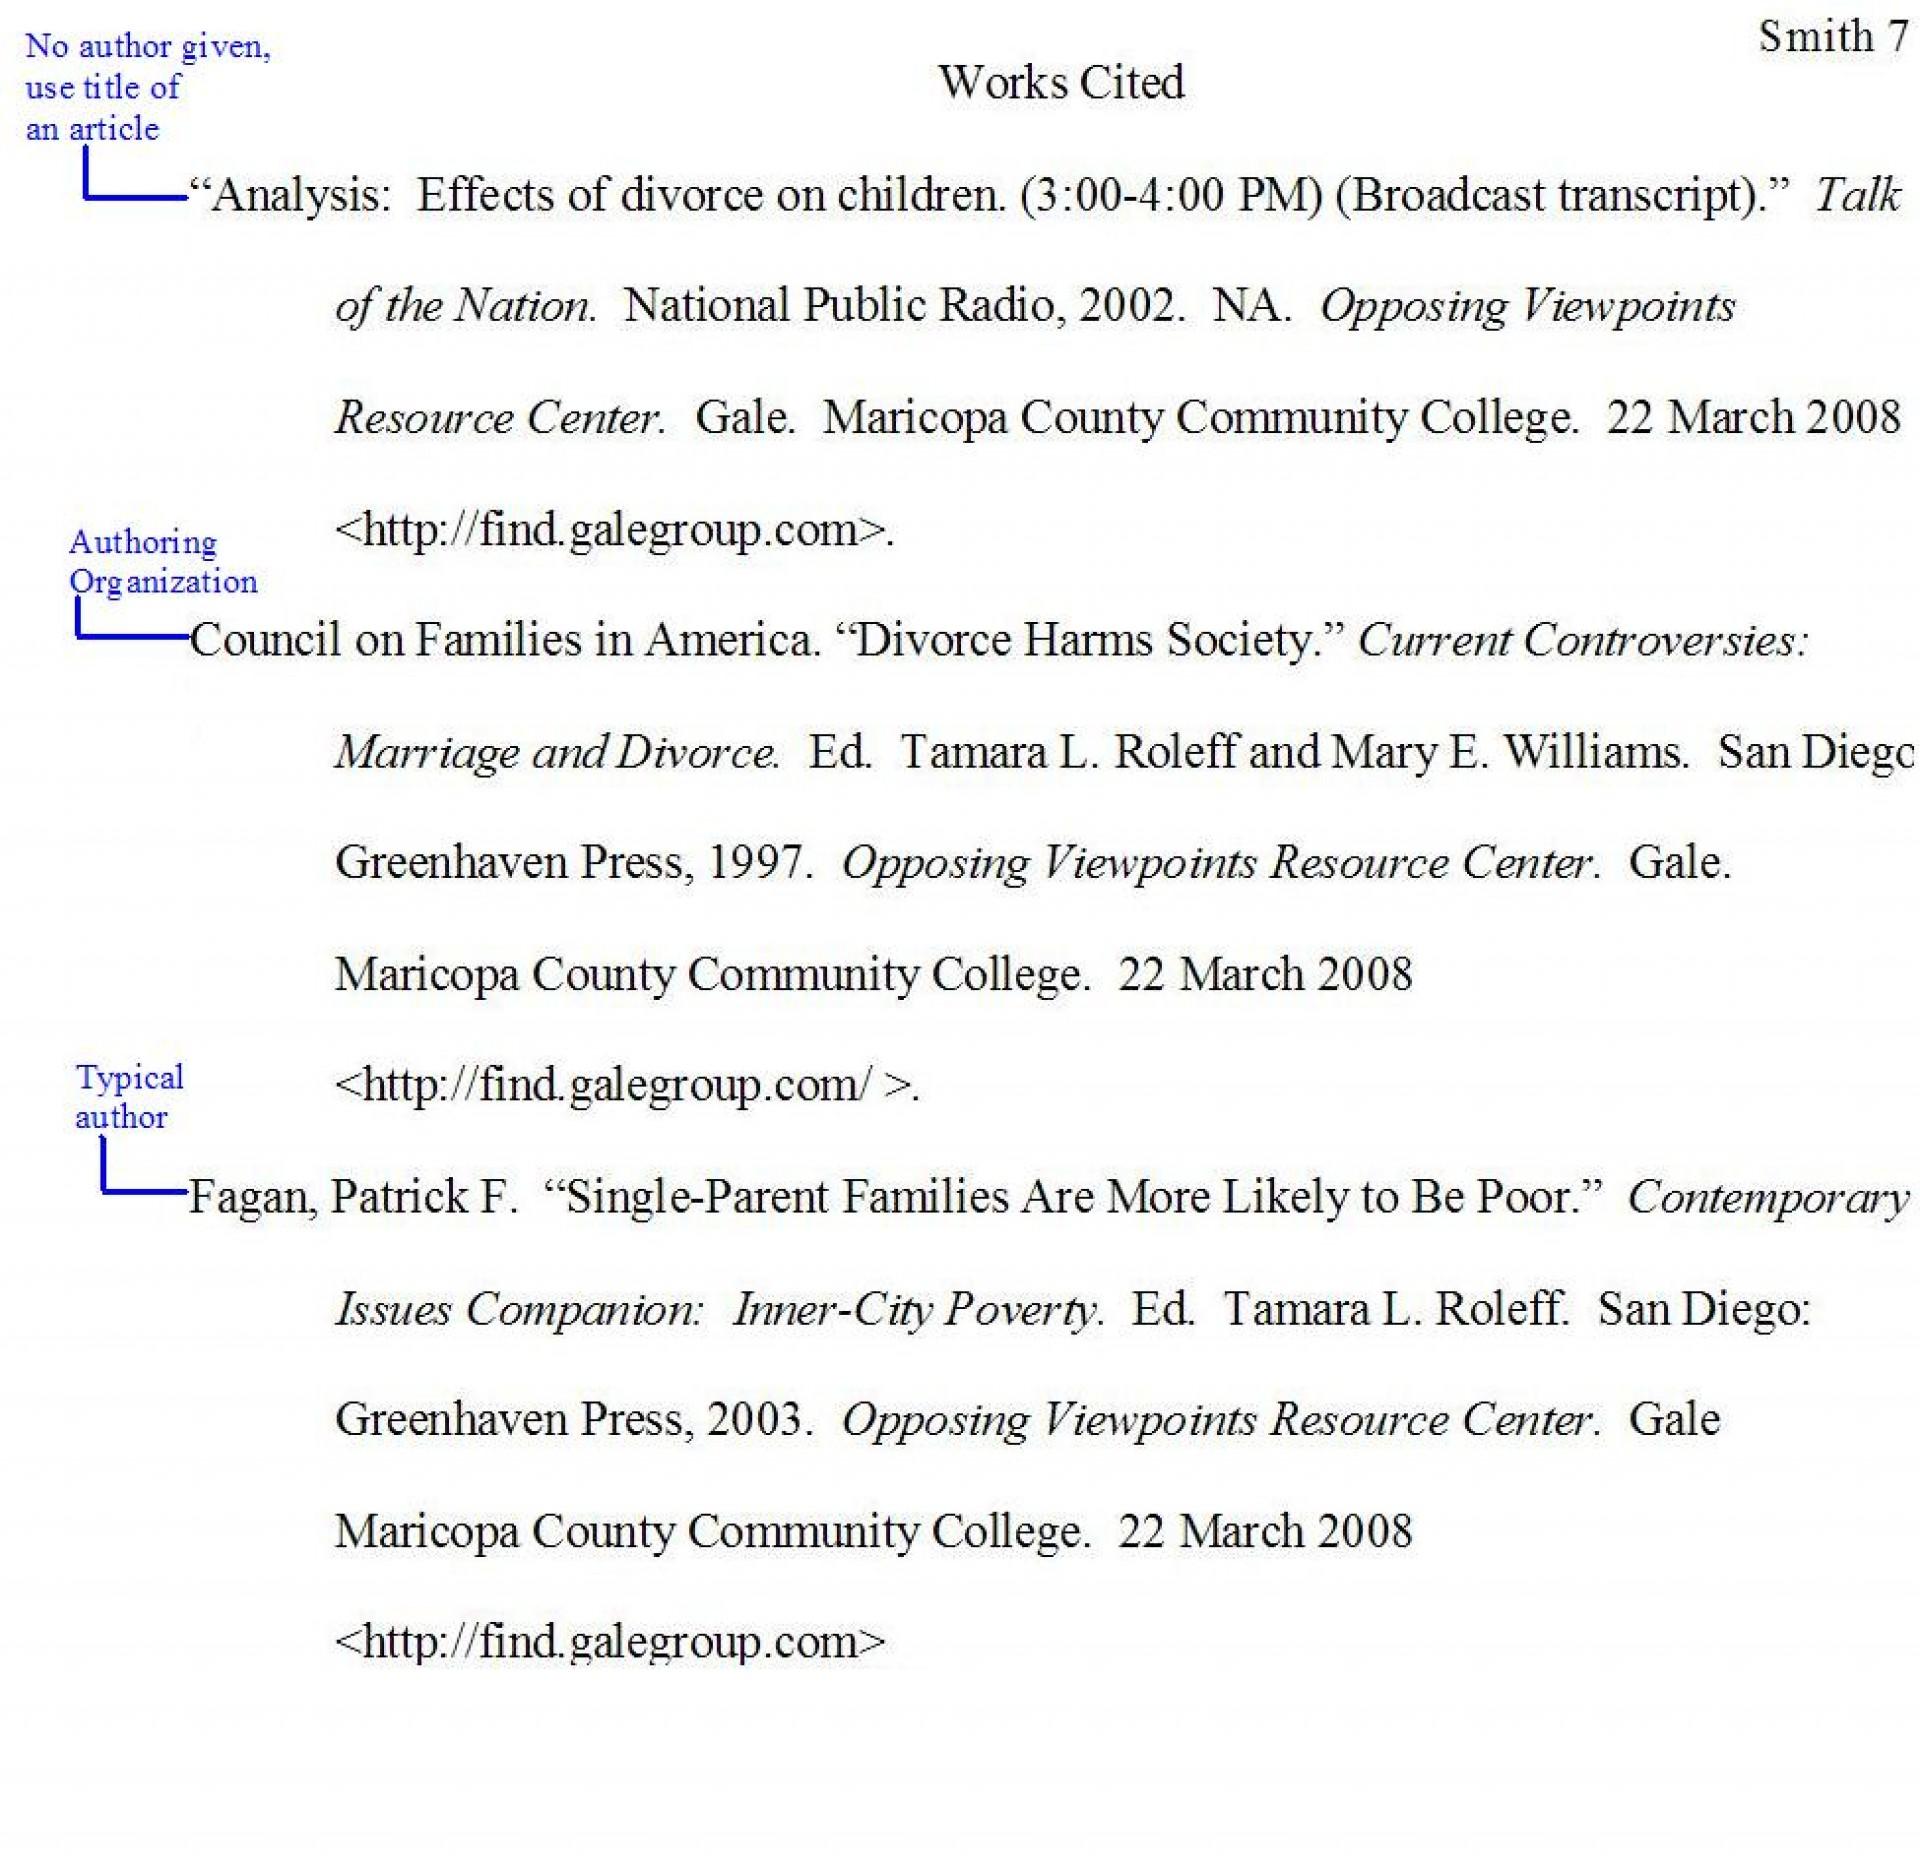 007 Essay Example In Citation Samplewrkctd Striking Text Parenthetical Apa Multiple Authors Website 1920